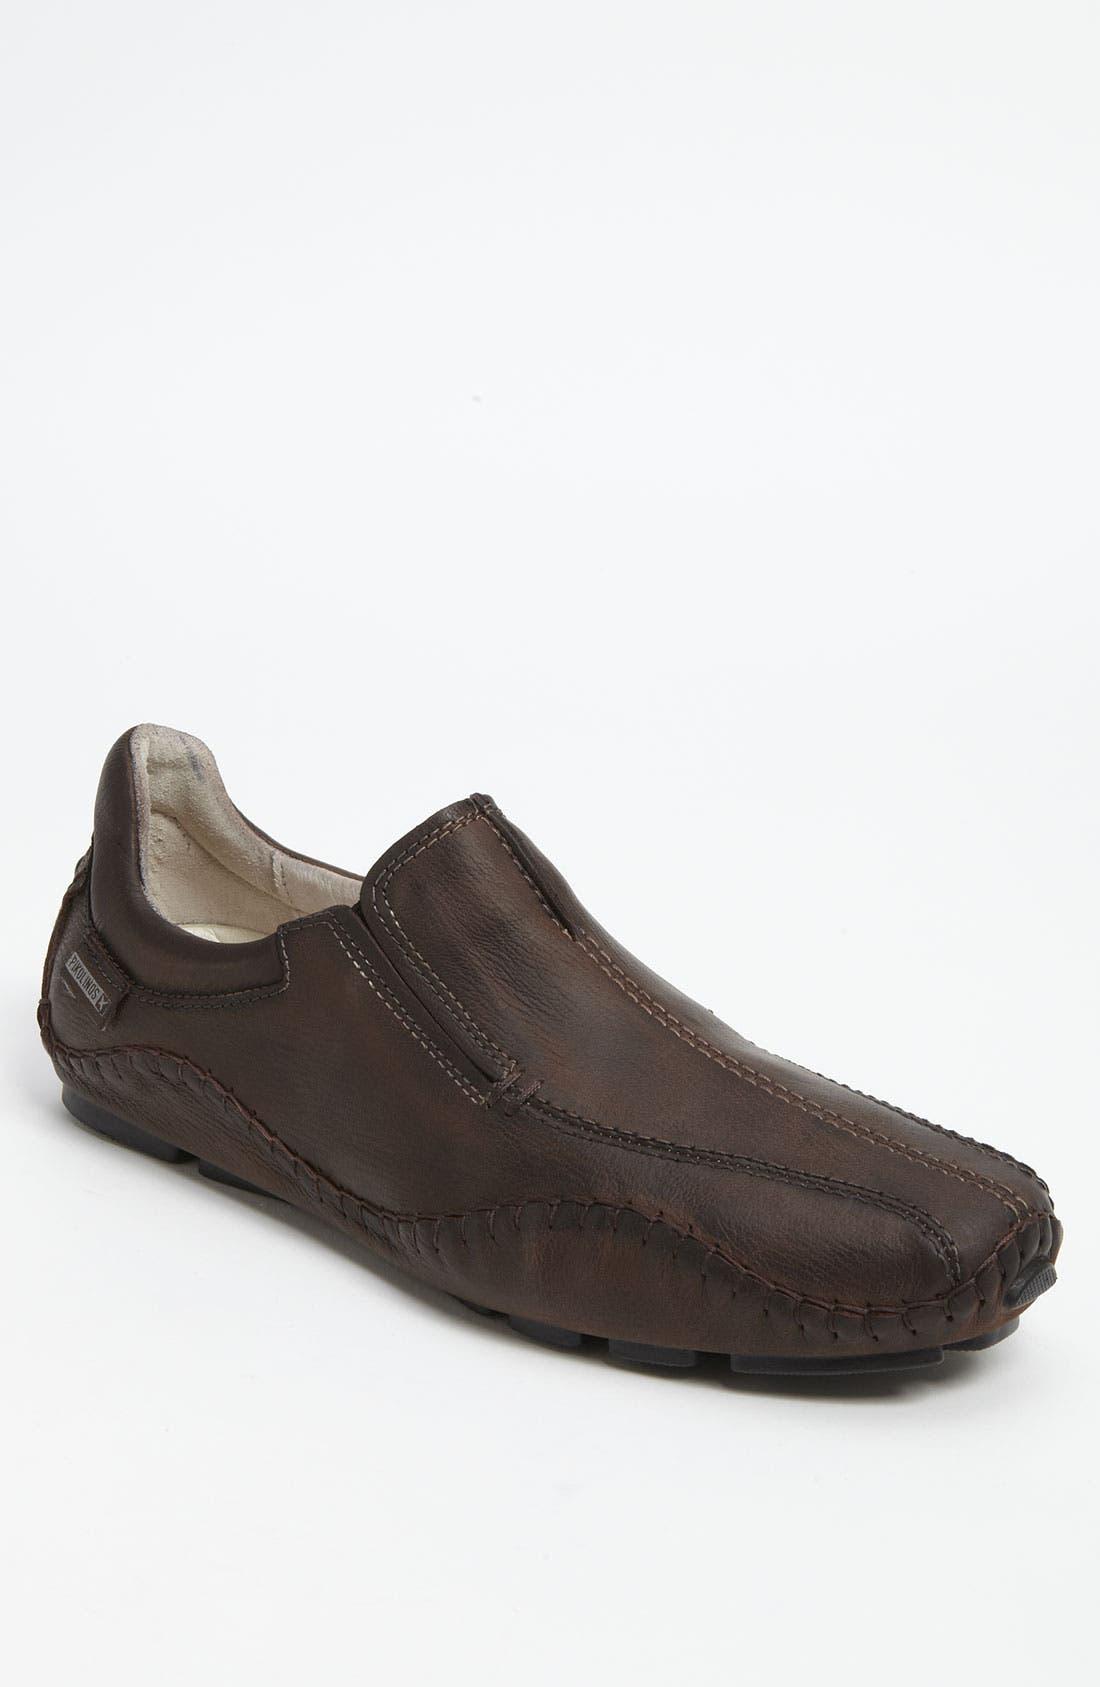 Alternate Image 1 Selected - PIKOLINOS 'Fuencarral' Driving Shoe